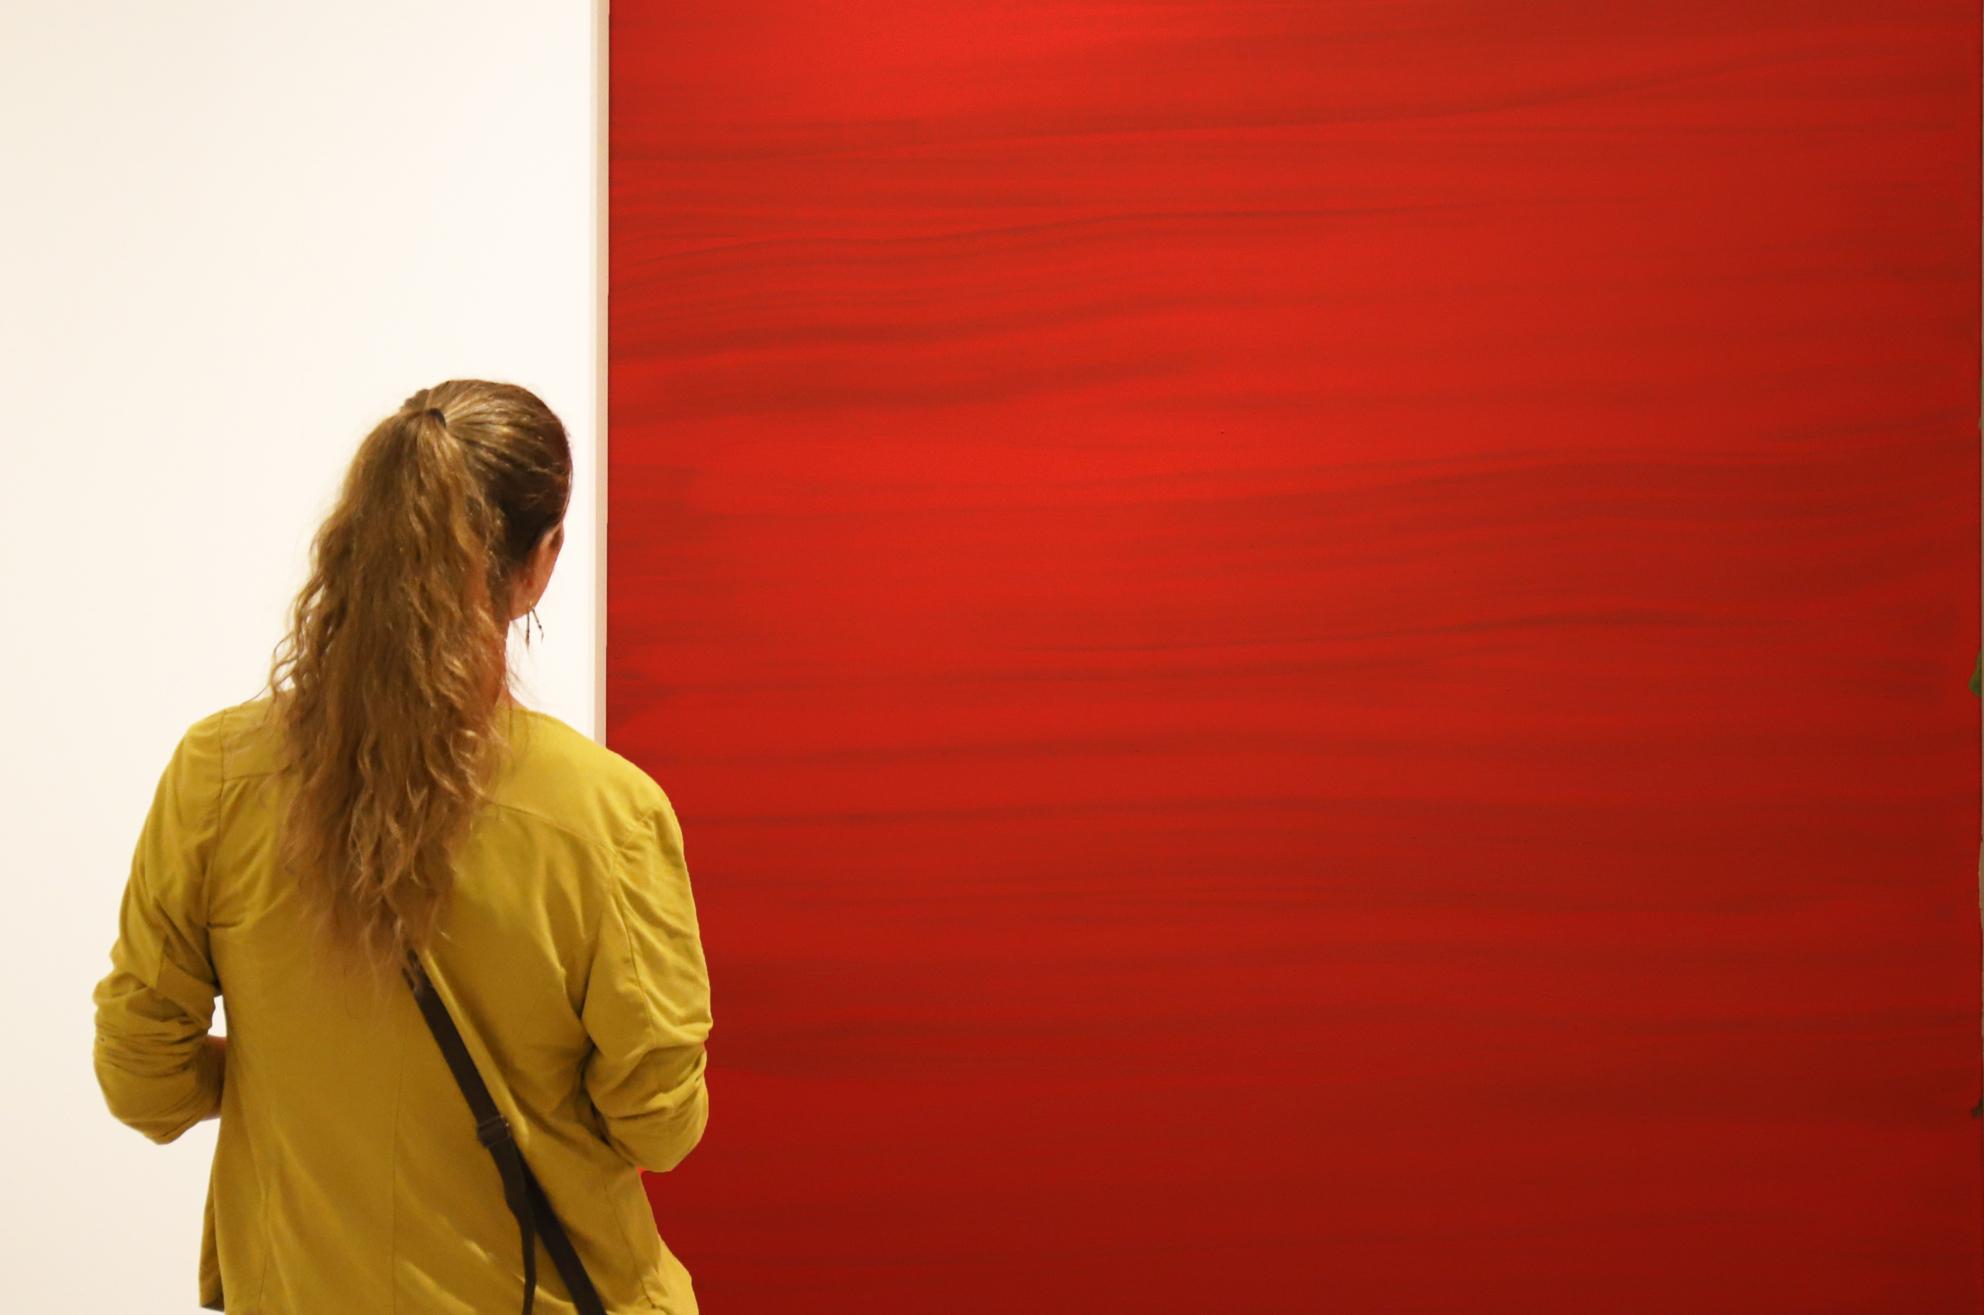 Detalle de Tendo 2017. Acrílico sobre lino. 190 x 150 cm. Nico Munuera.